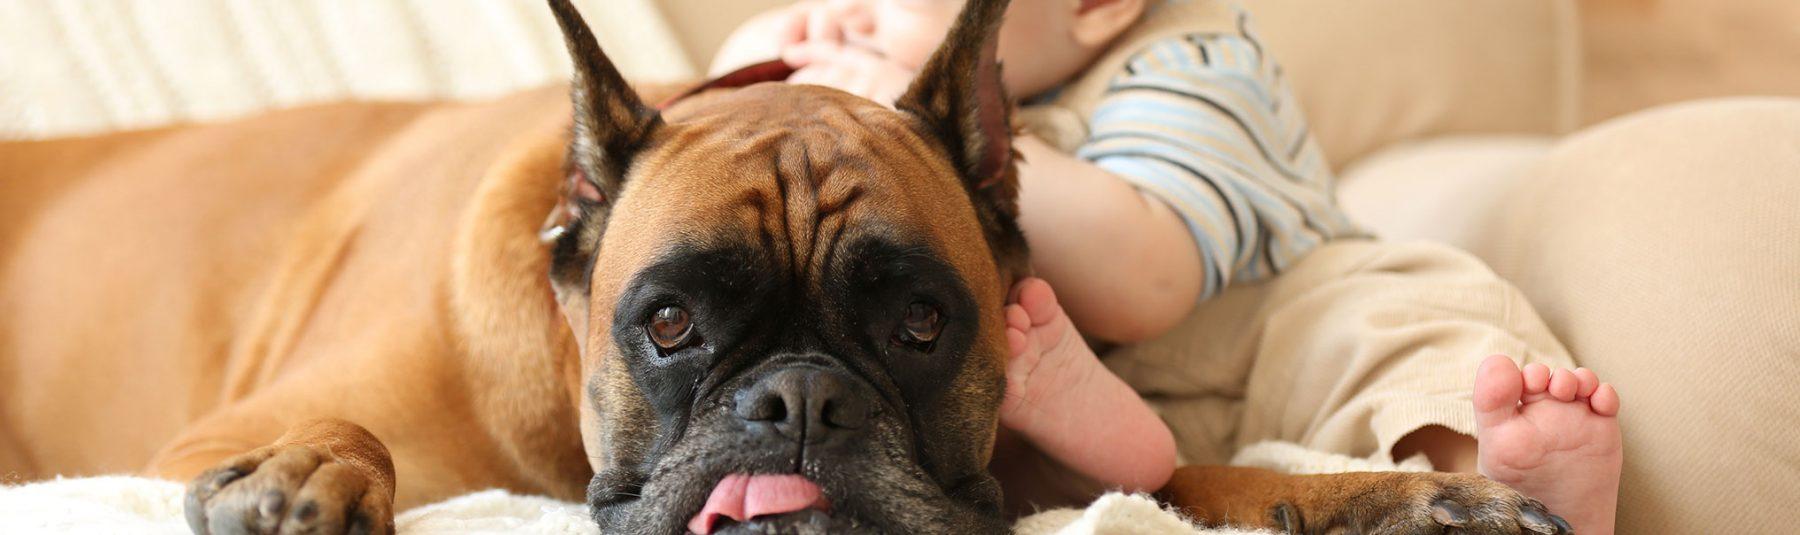 dog_behavioural